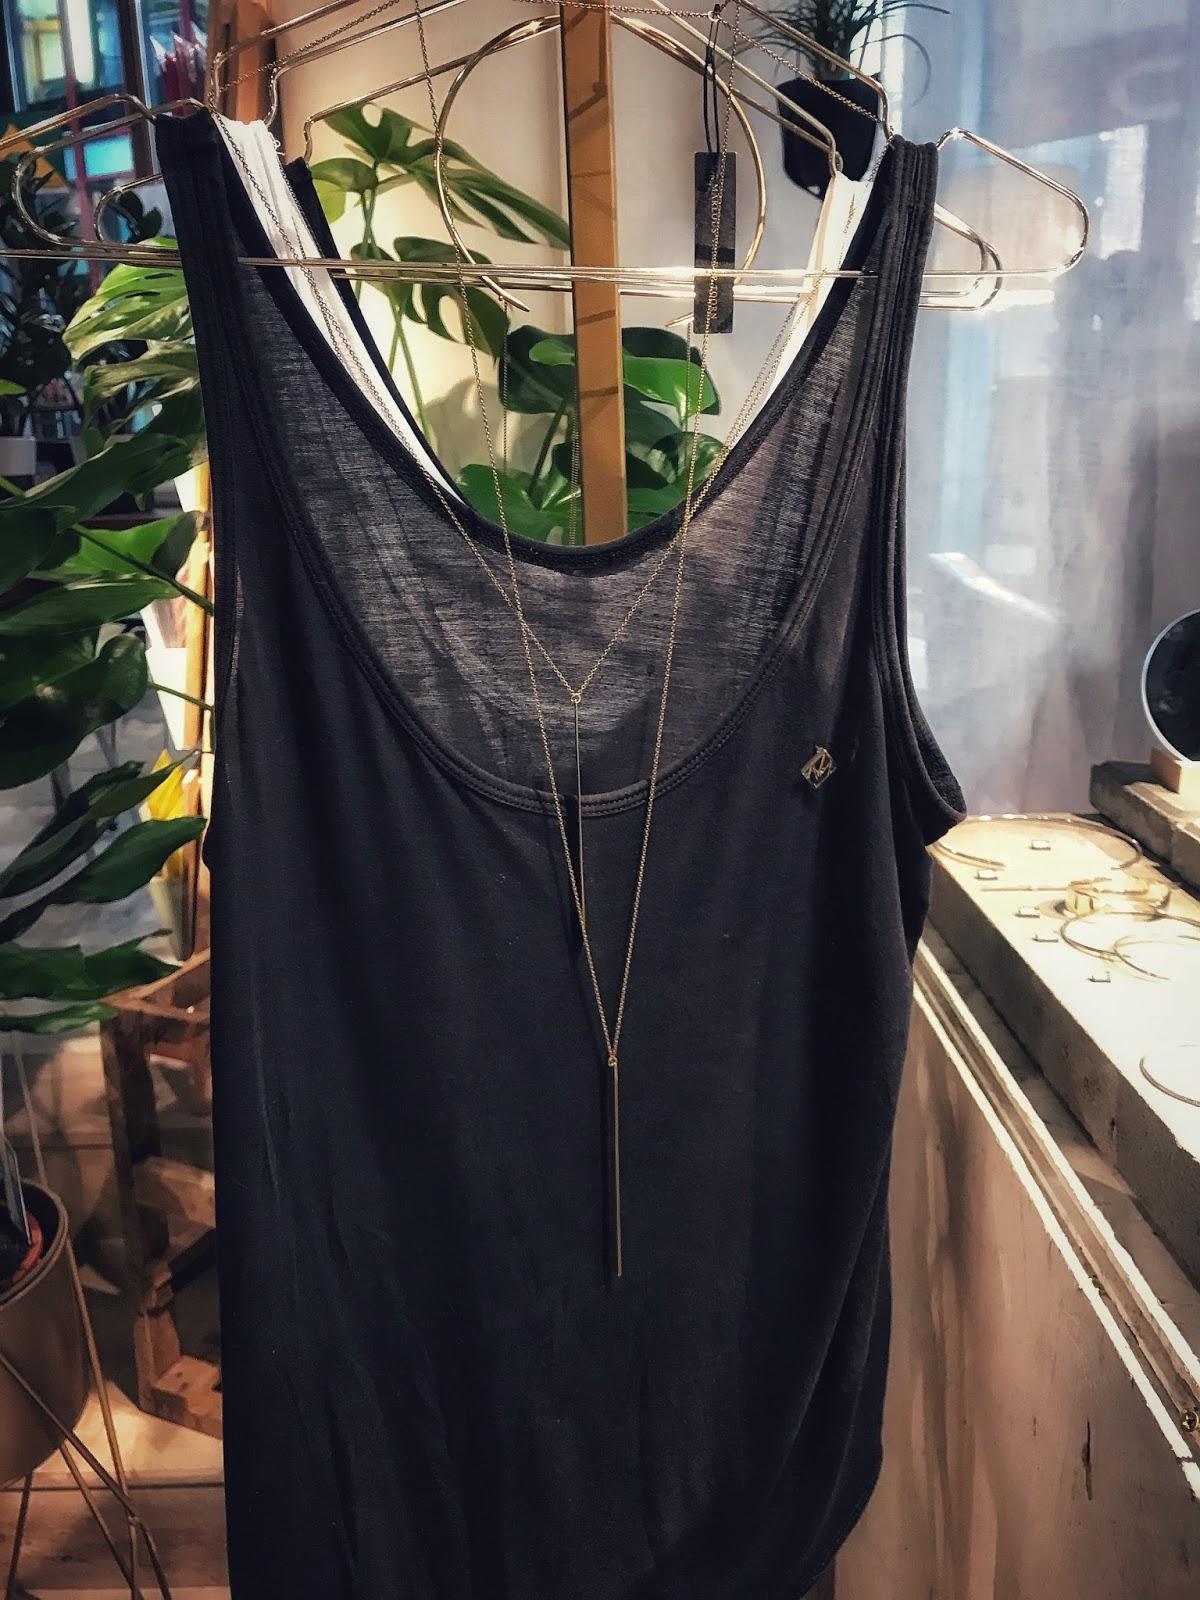 Fashion Shopping in Den Haag Netherlands